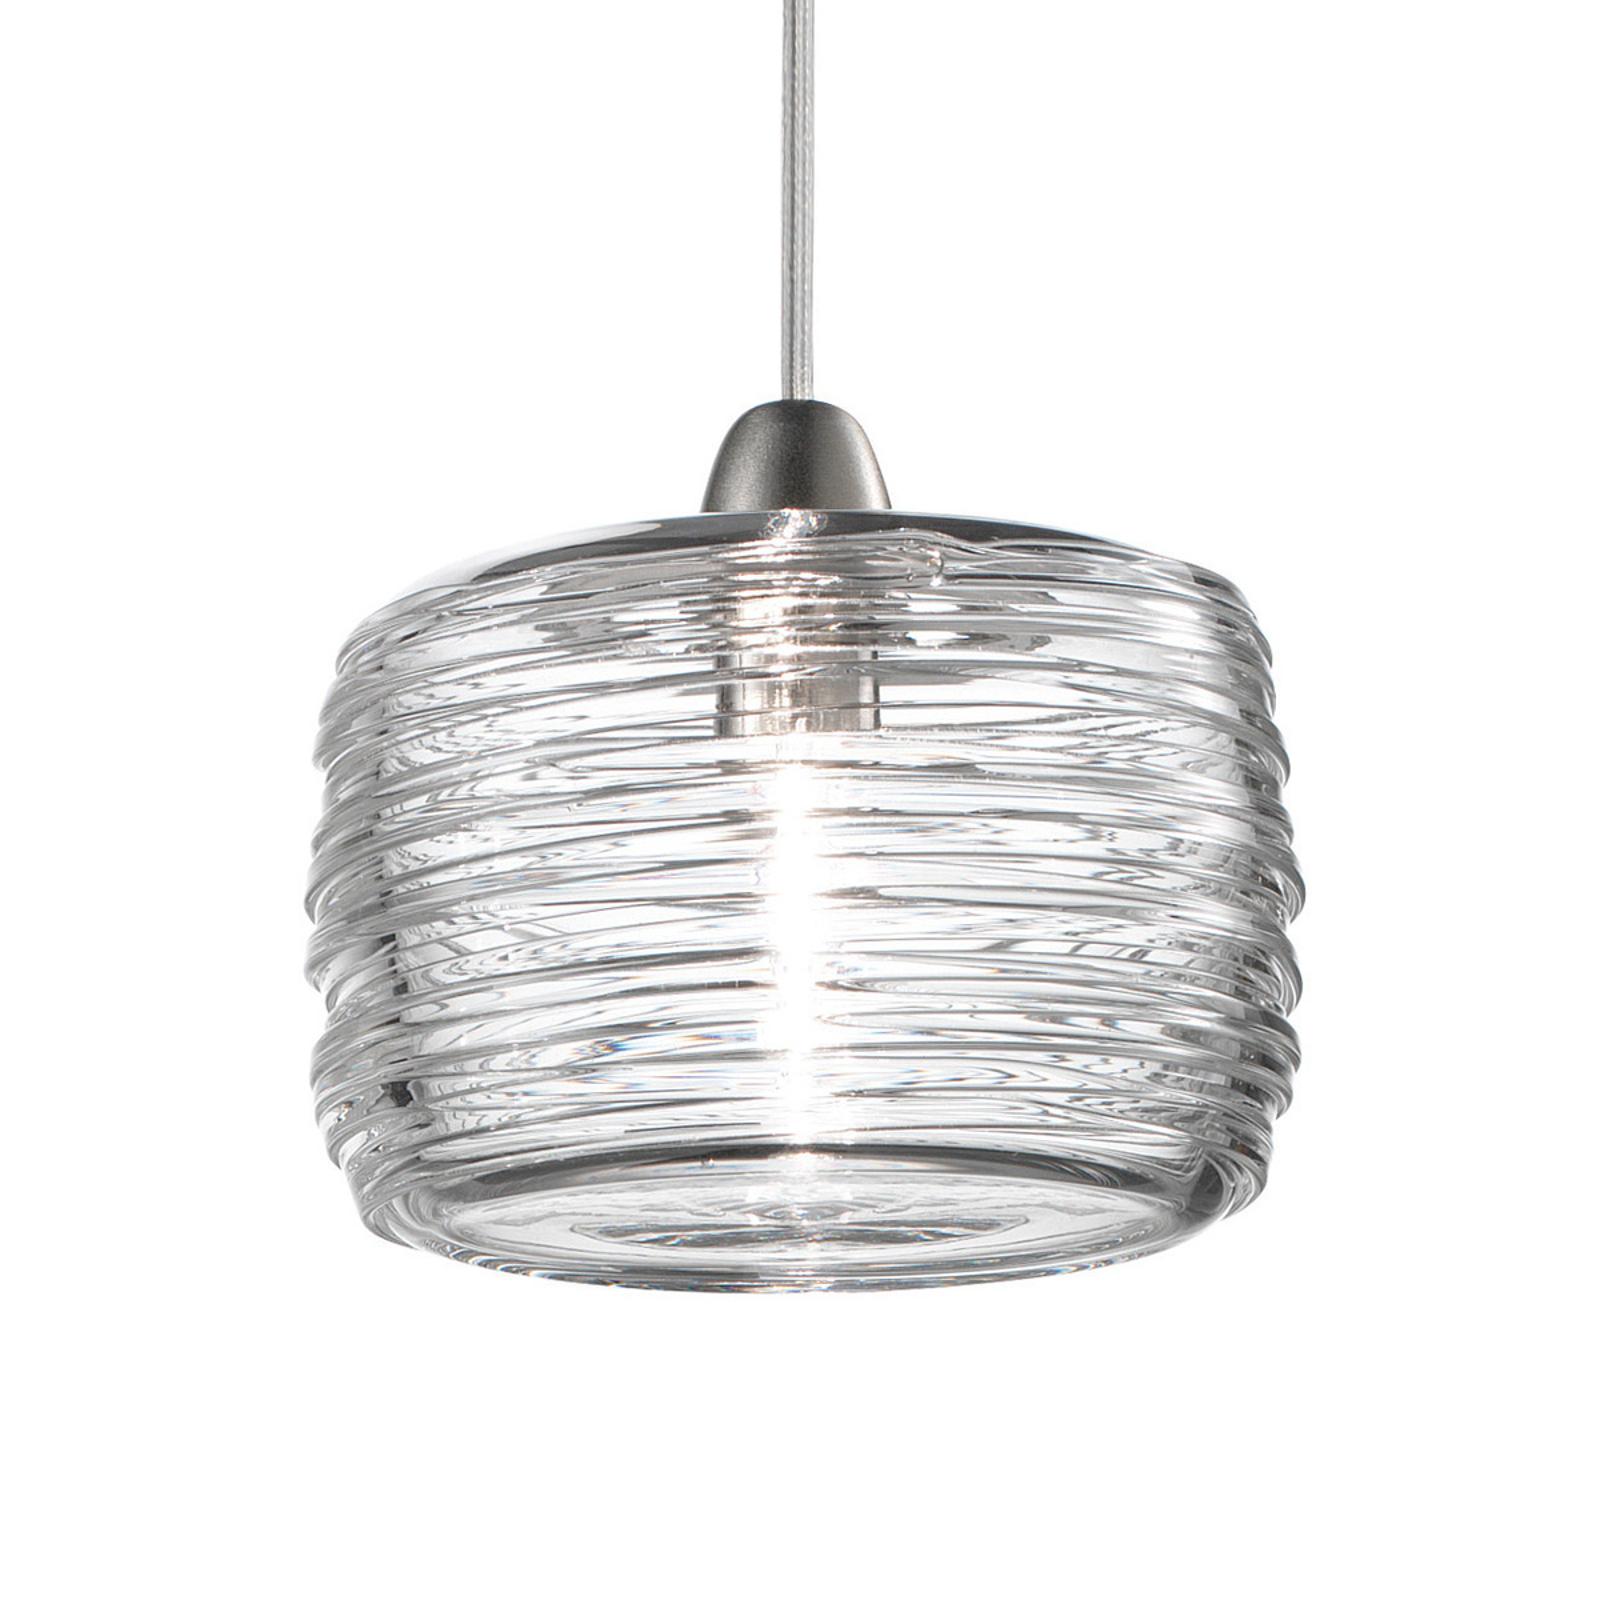 LED-Pendellampe Damasco klar Ø 12 cm